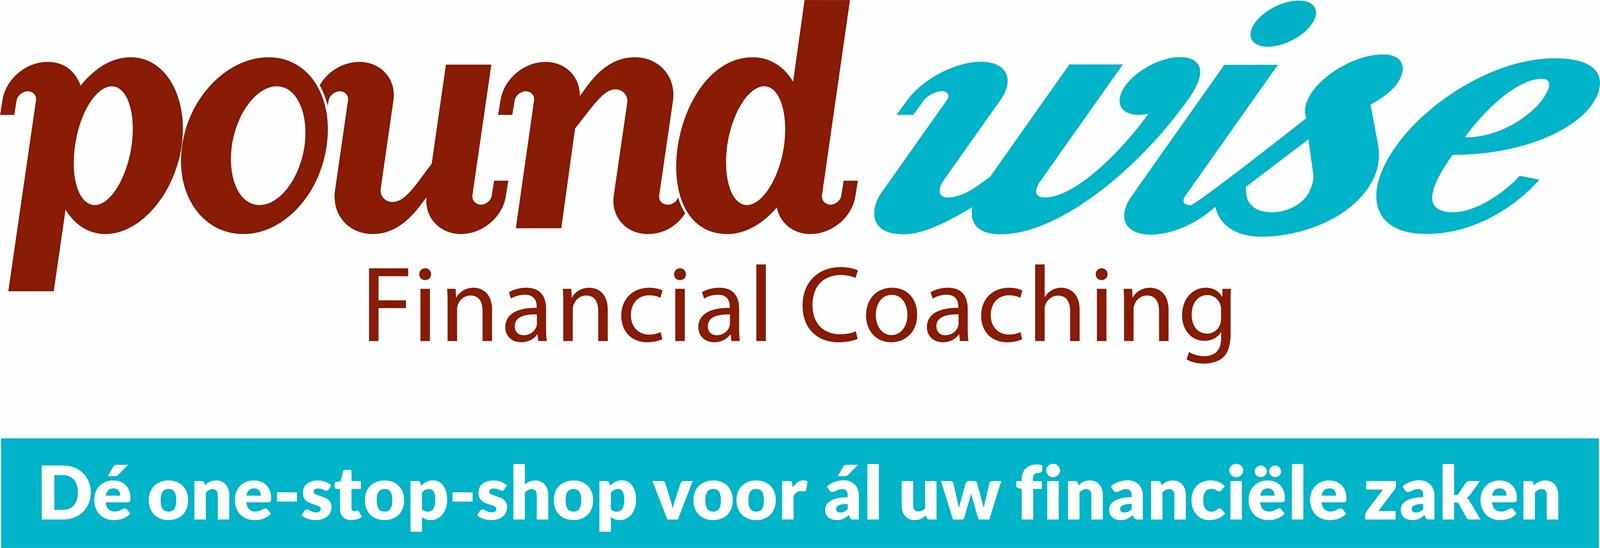 Logo van PoundWise Financial Coaching